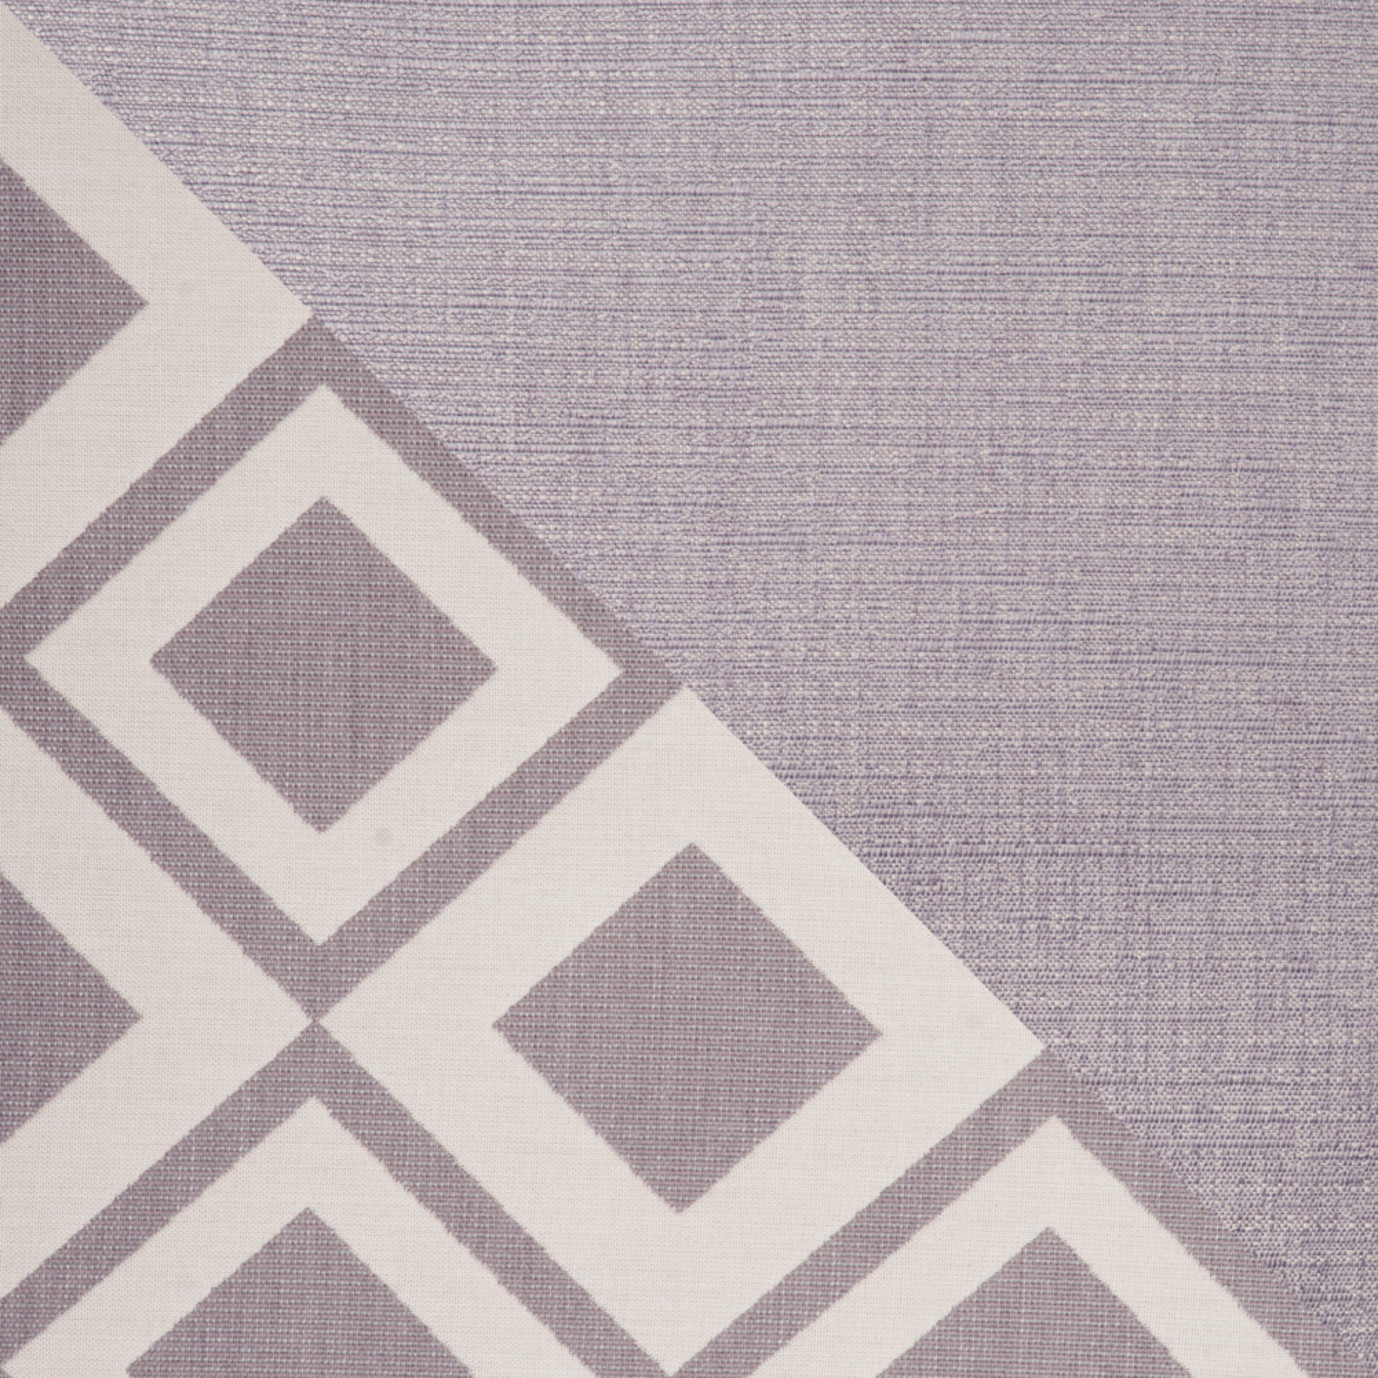 Barcelo™ Chaise Lounge 2pk - Wisteria Lavender